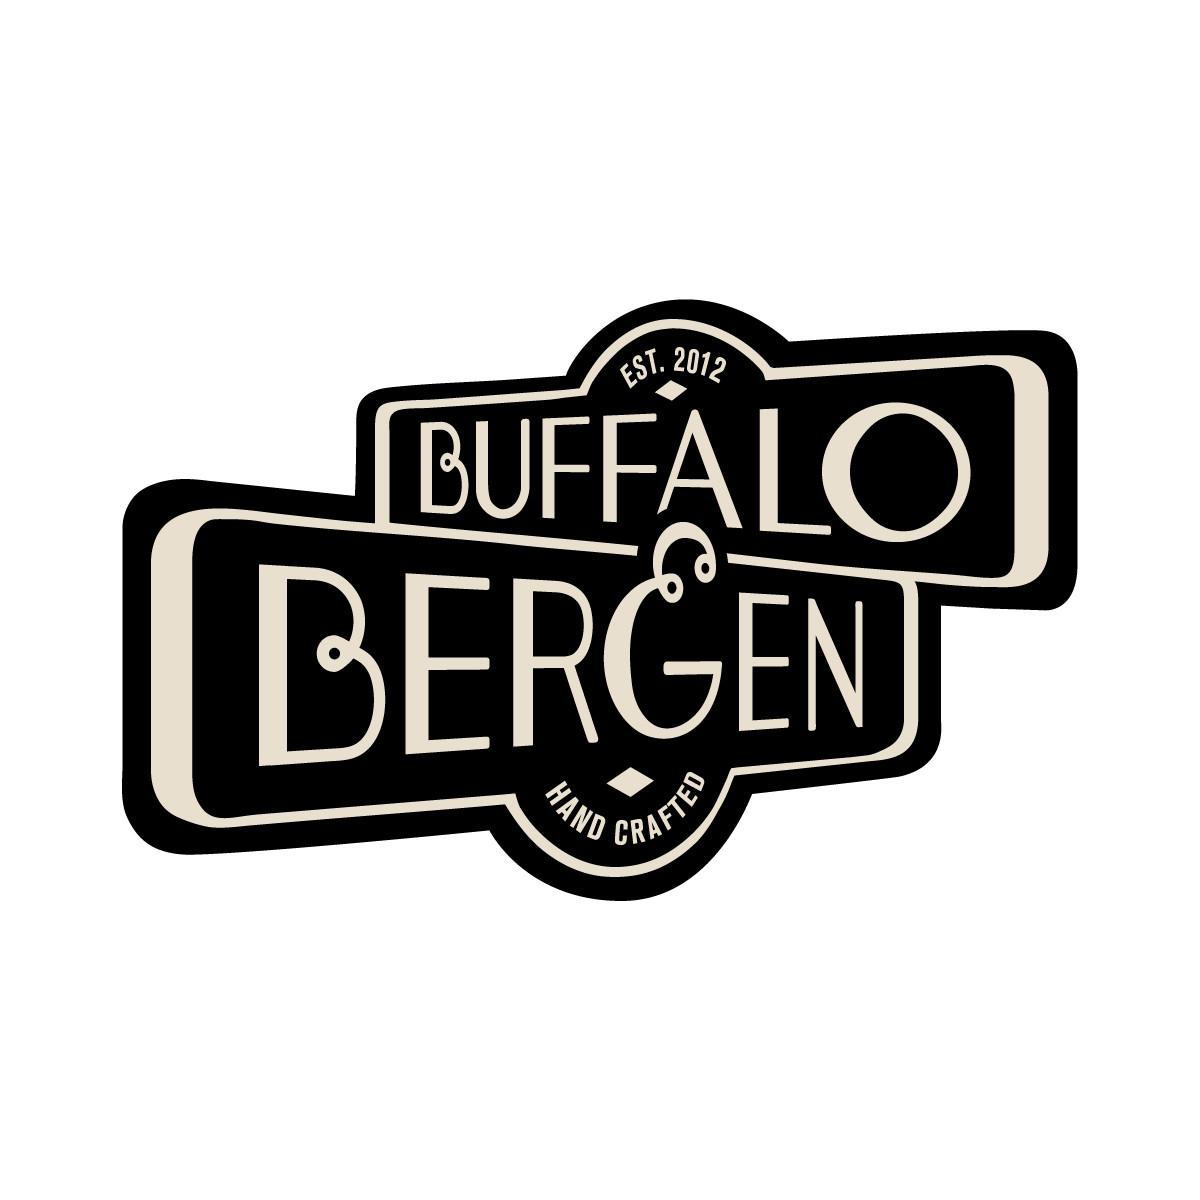 Buffalo & Bergen.001.jpeg